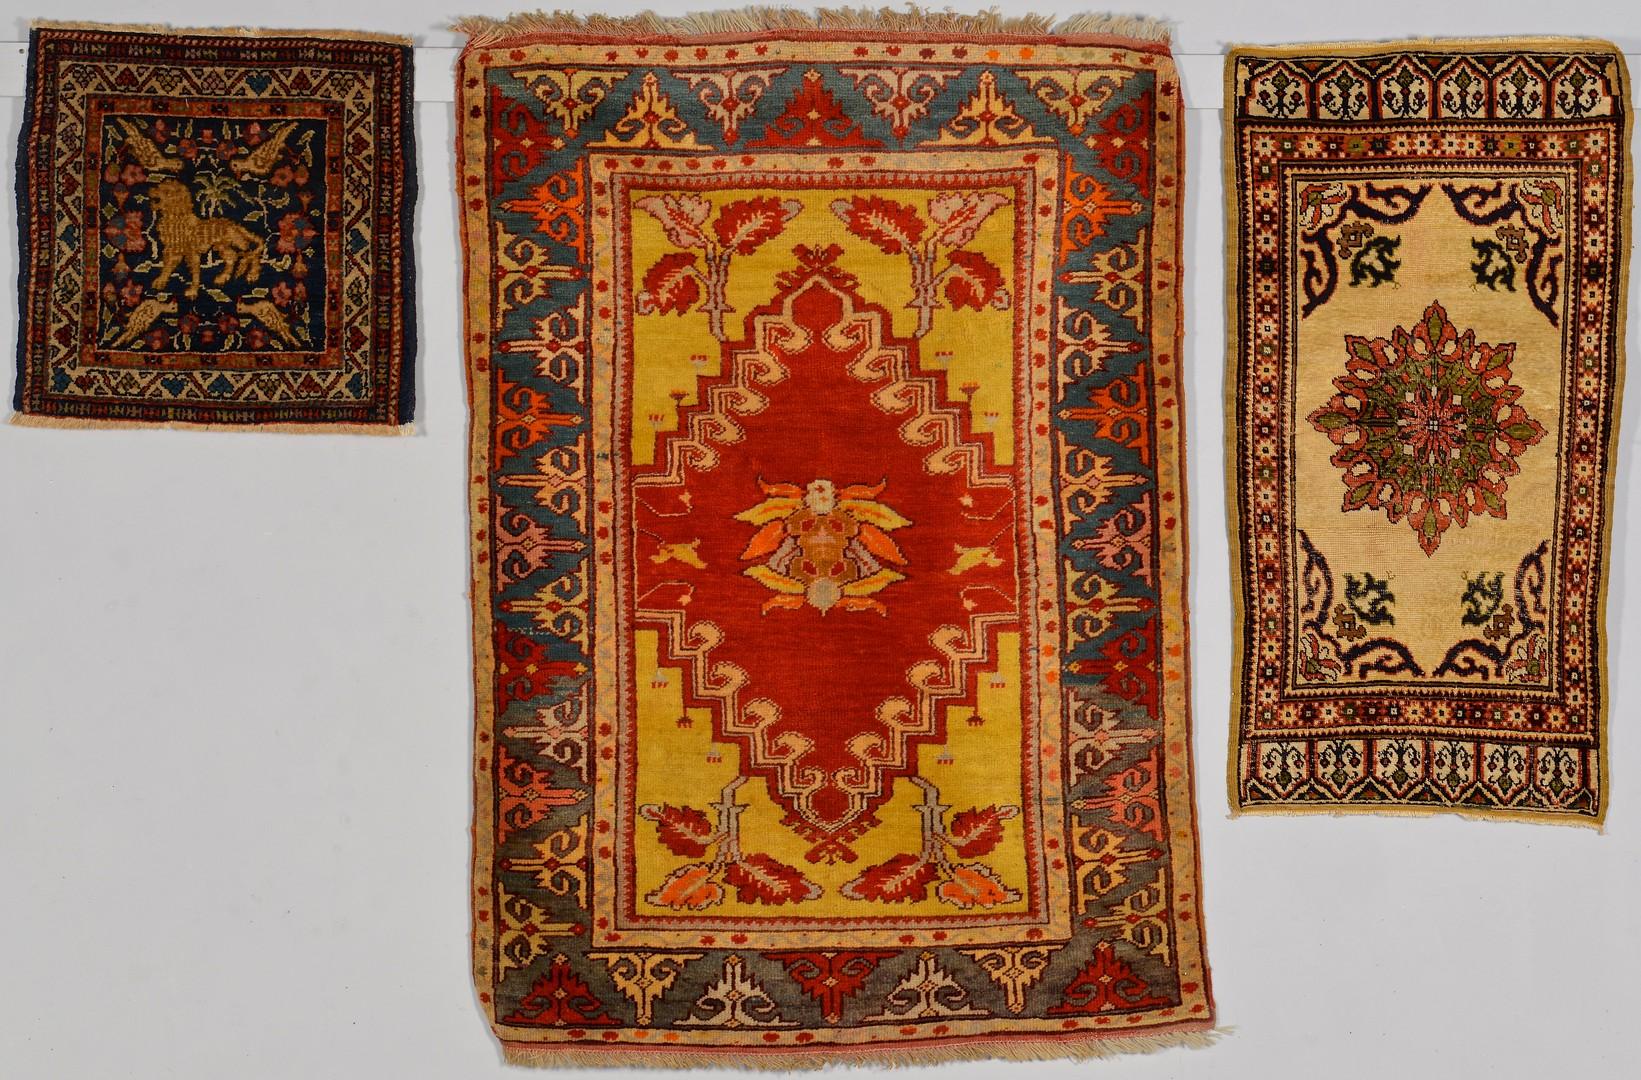 Lot 906: Group of 3 Anatolian Area Rugs